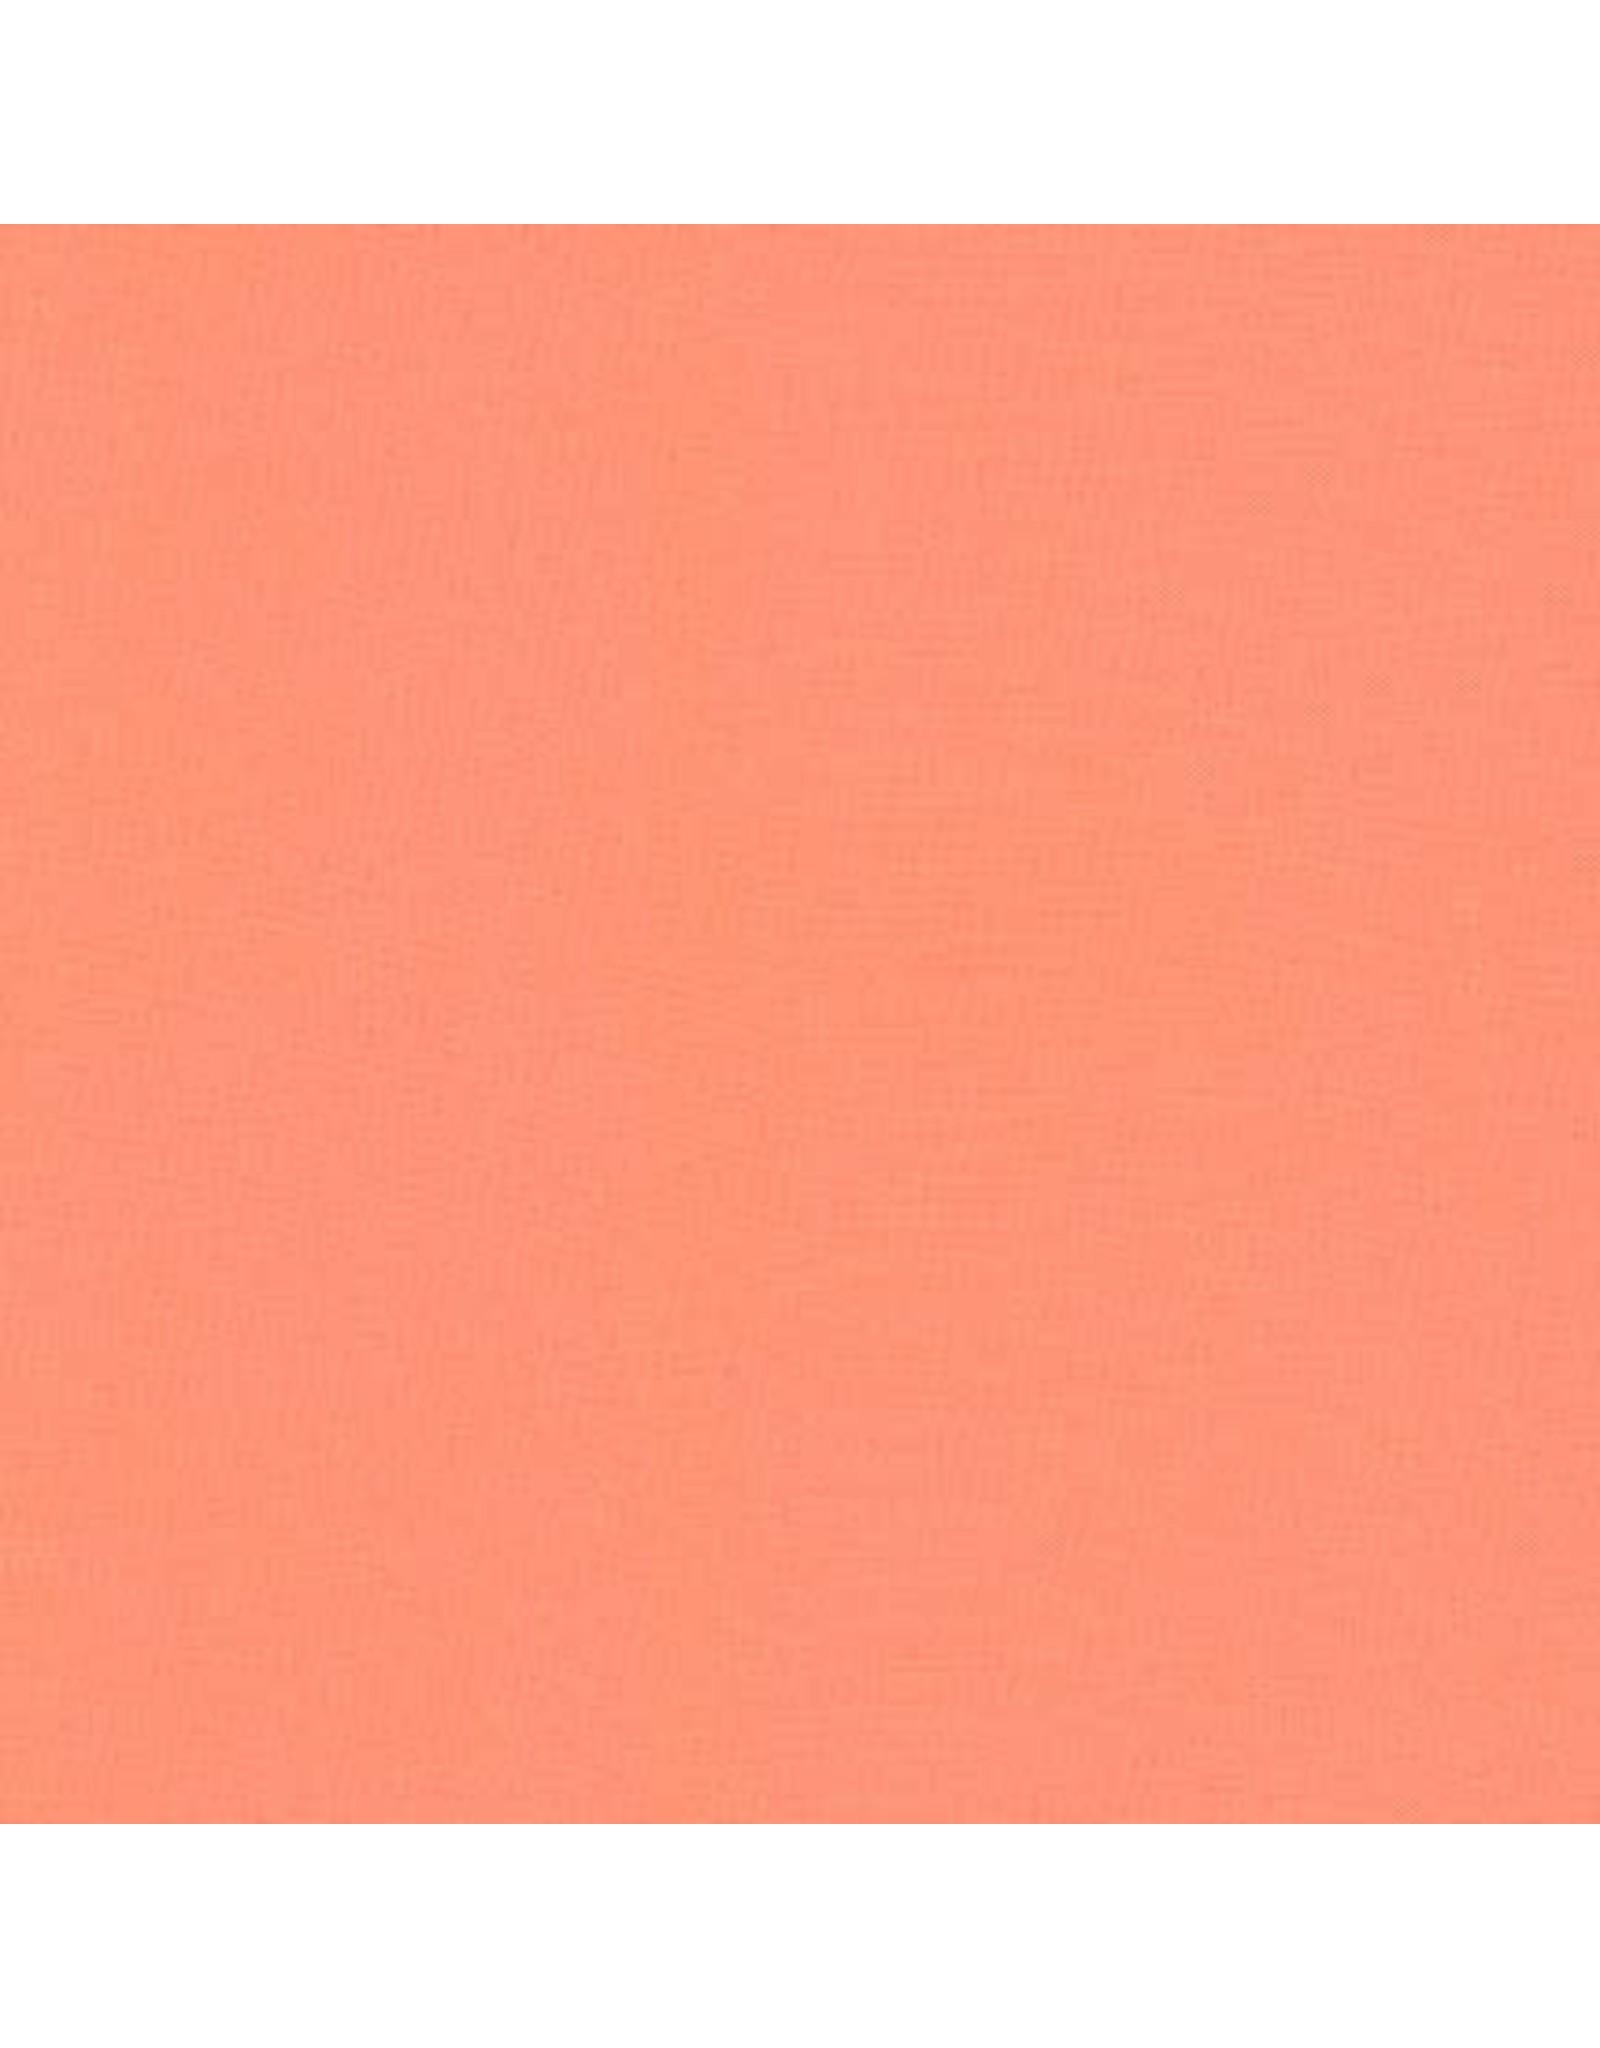 Robert Kaufman Kona Cotton in Creamsicle, Fabric Half-Yards